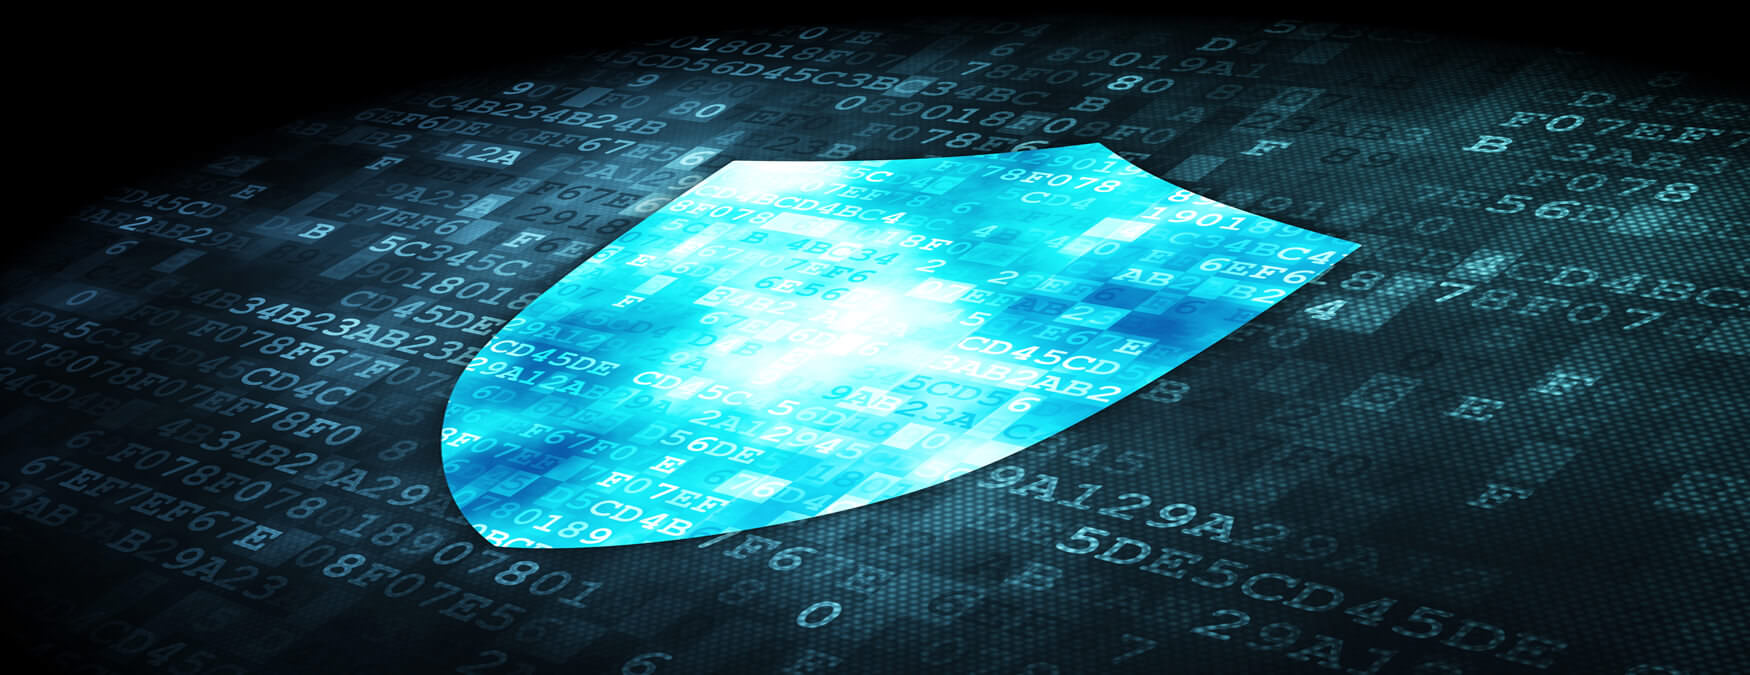 Electronic Data Destruction - AGR